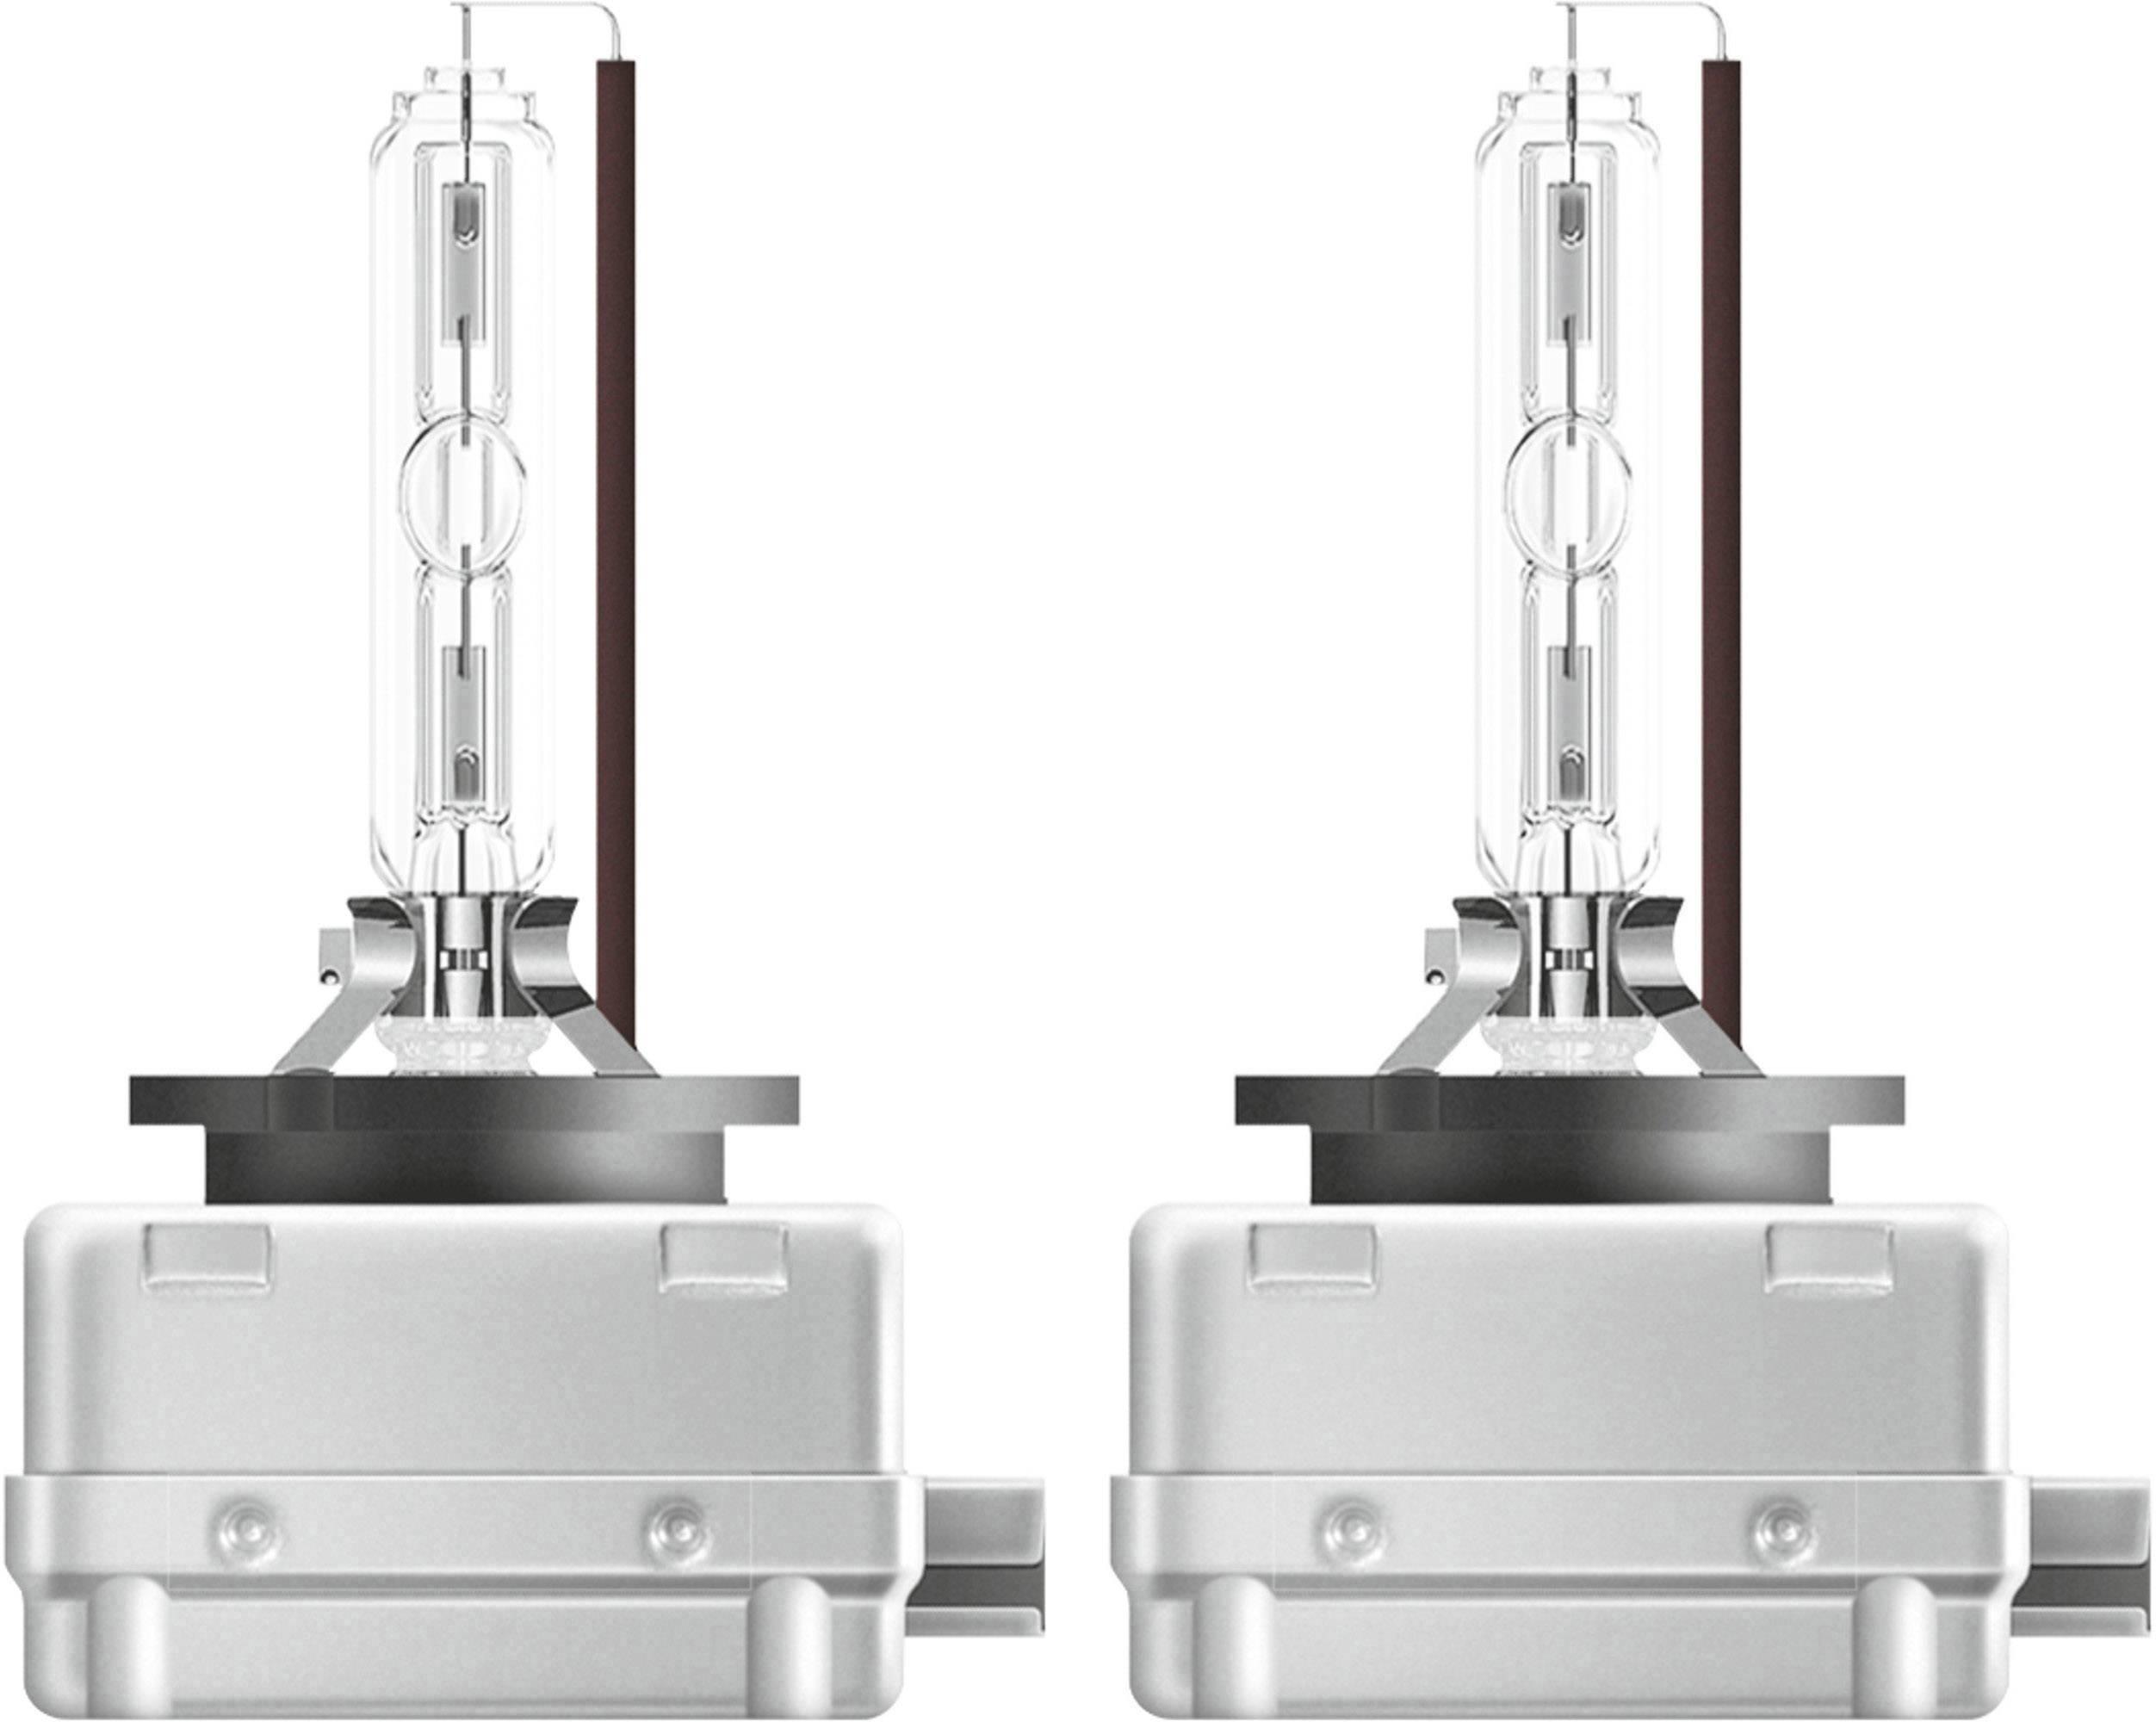 OSRAM Xenarc Night Breaker Laser Xenon Car Headlight Bulbs D1S